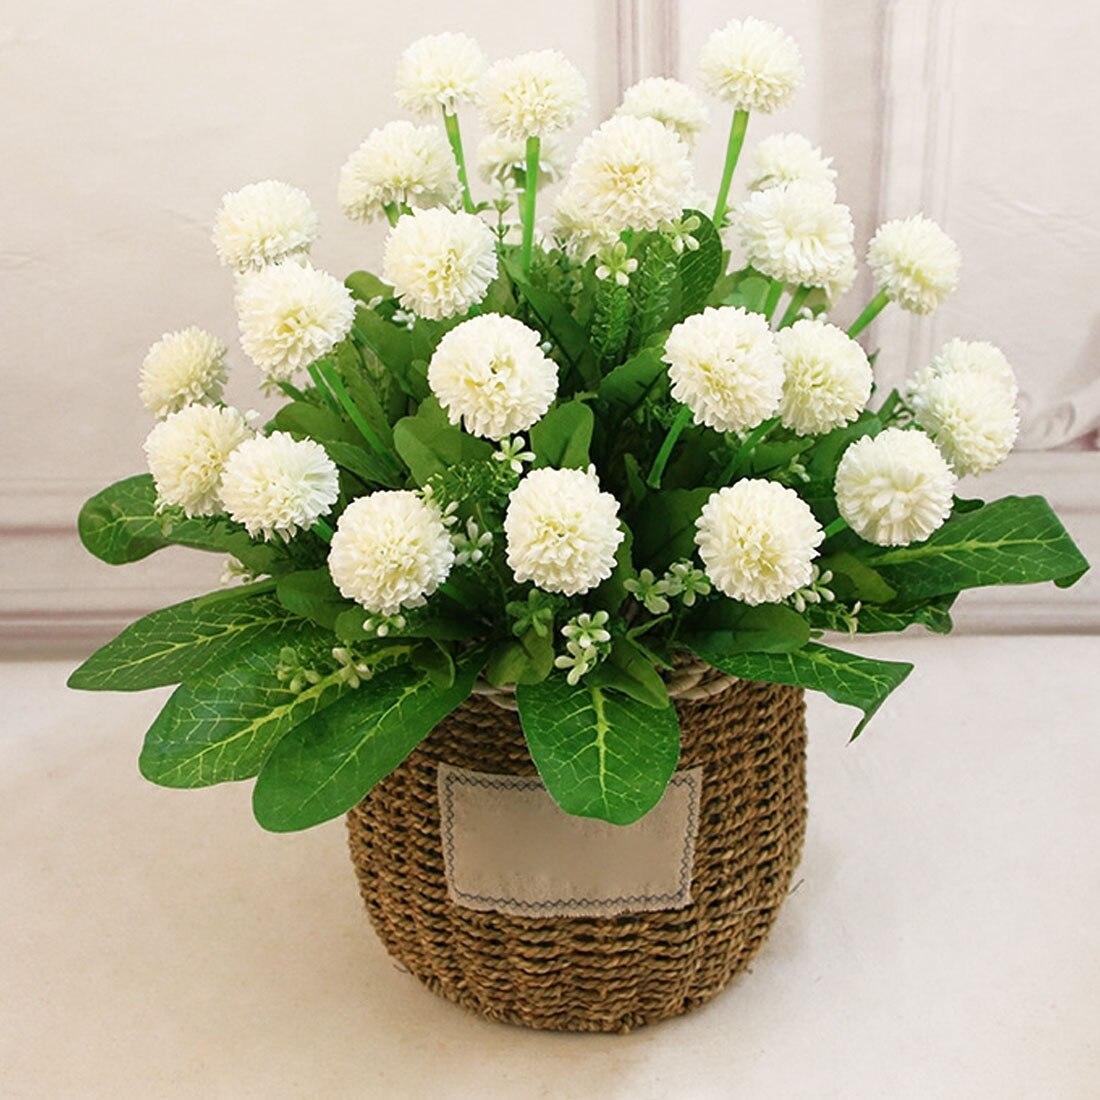 Оптовая продажа 6 вилка глава 9 Свадьба Искусственный цветок Пион цветок гортензии Главн ...